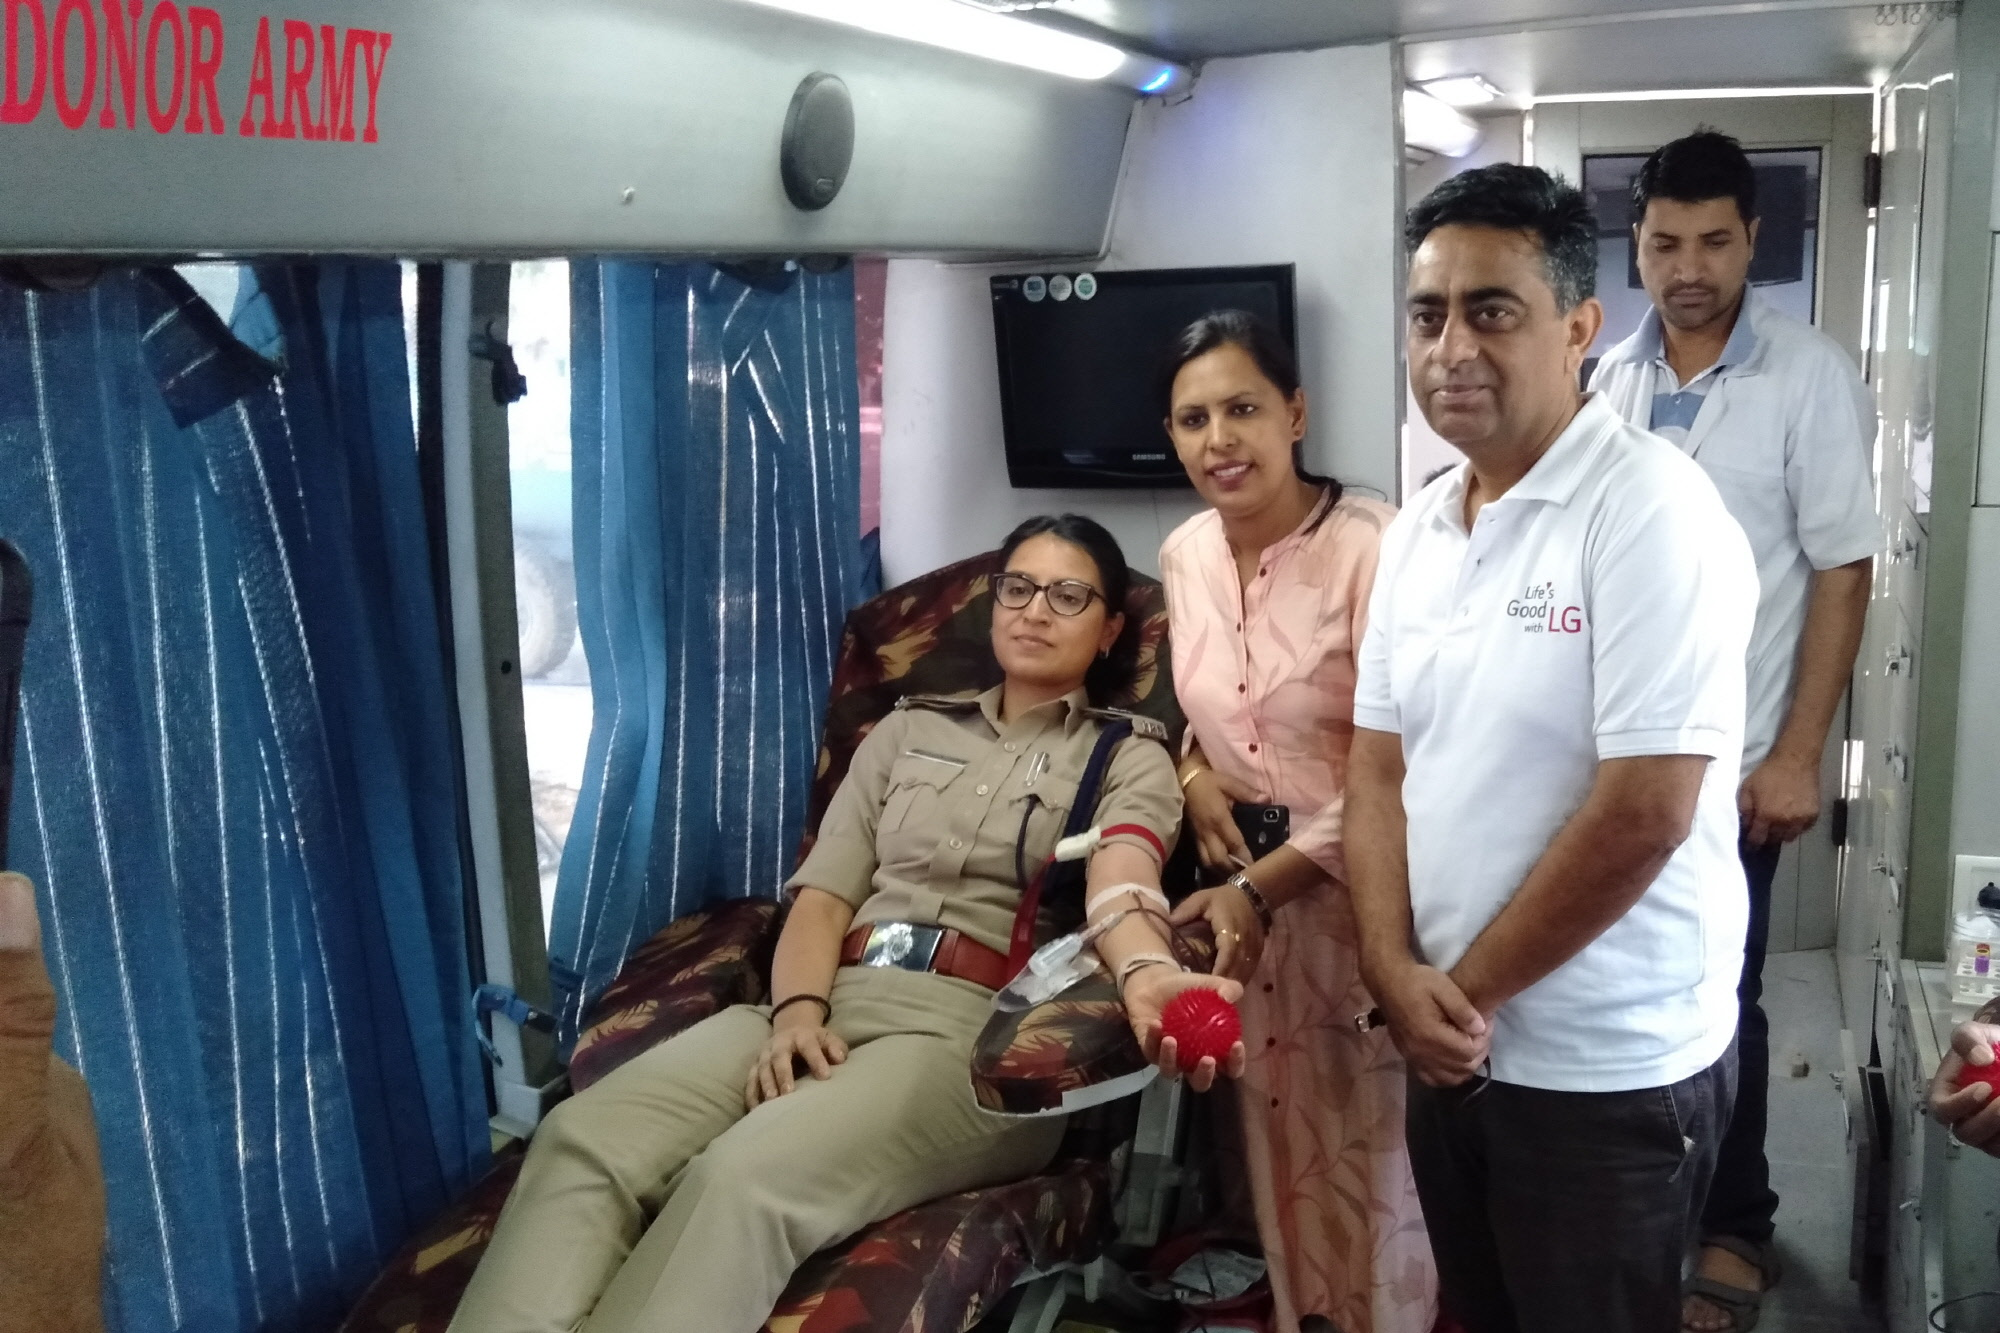 LG전자가 지난 11일 '혈연을 맺자(Let's create blood relations)'는 구호를 내걸고 인도 47개 도시 71개 캠프에서 헌혈캠페인을 진행했다. 이날 LG전자 임직원과 거래선, 소비자 등 1만여 명이 참여했다